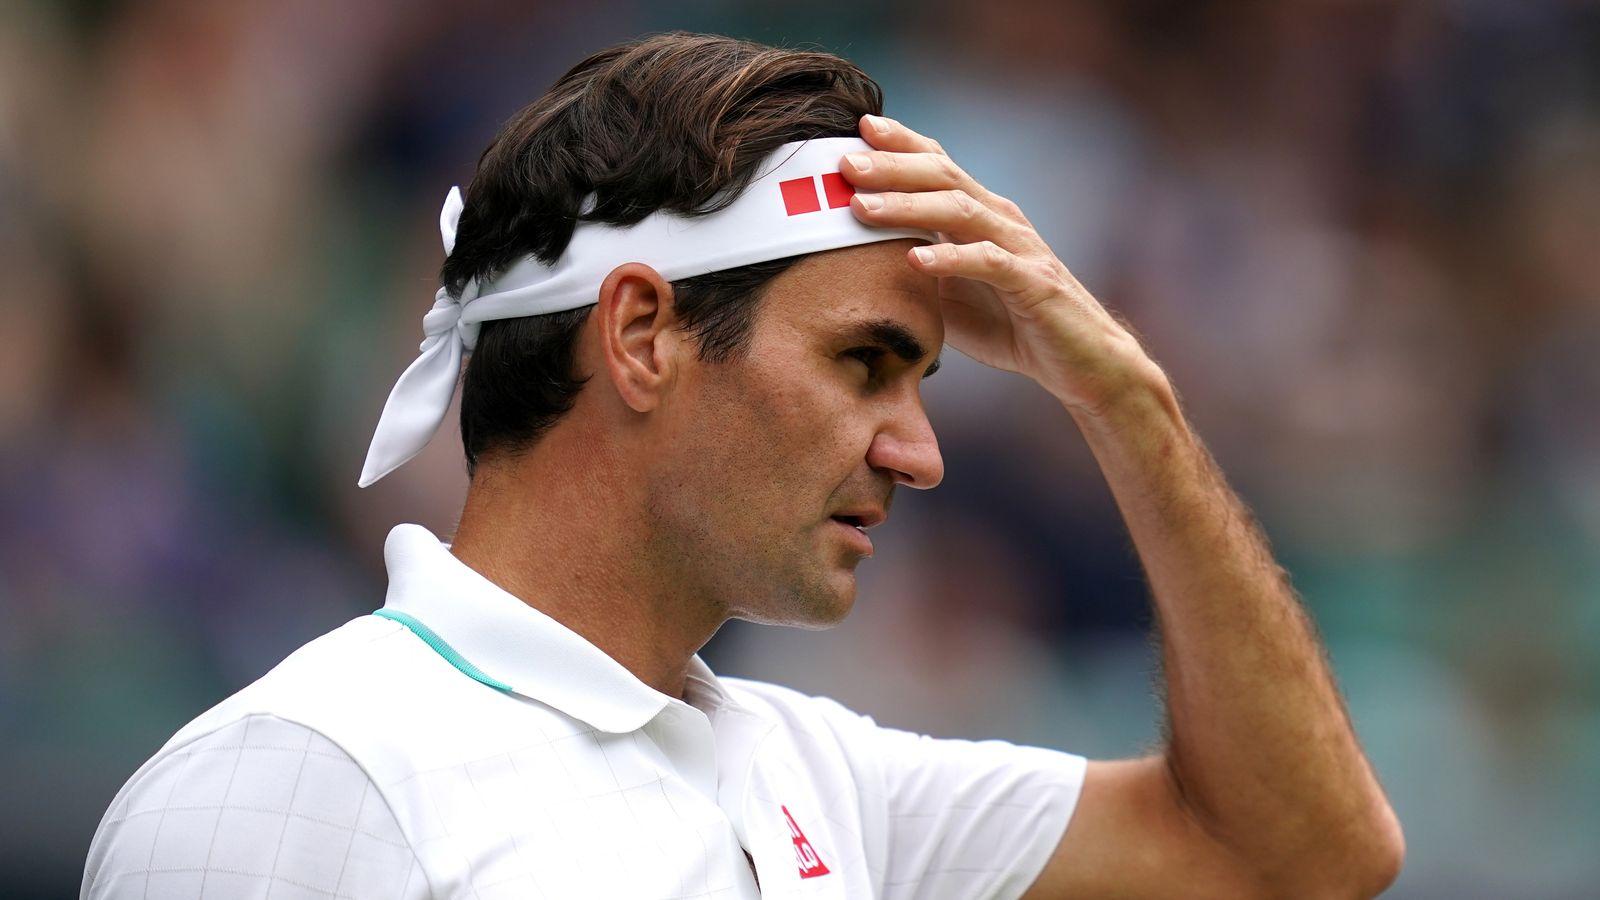 Roger Federer calls for 'evolution' in relationship between players and media